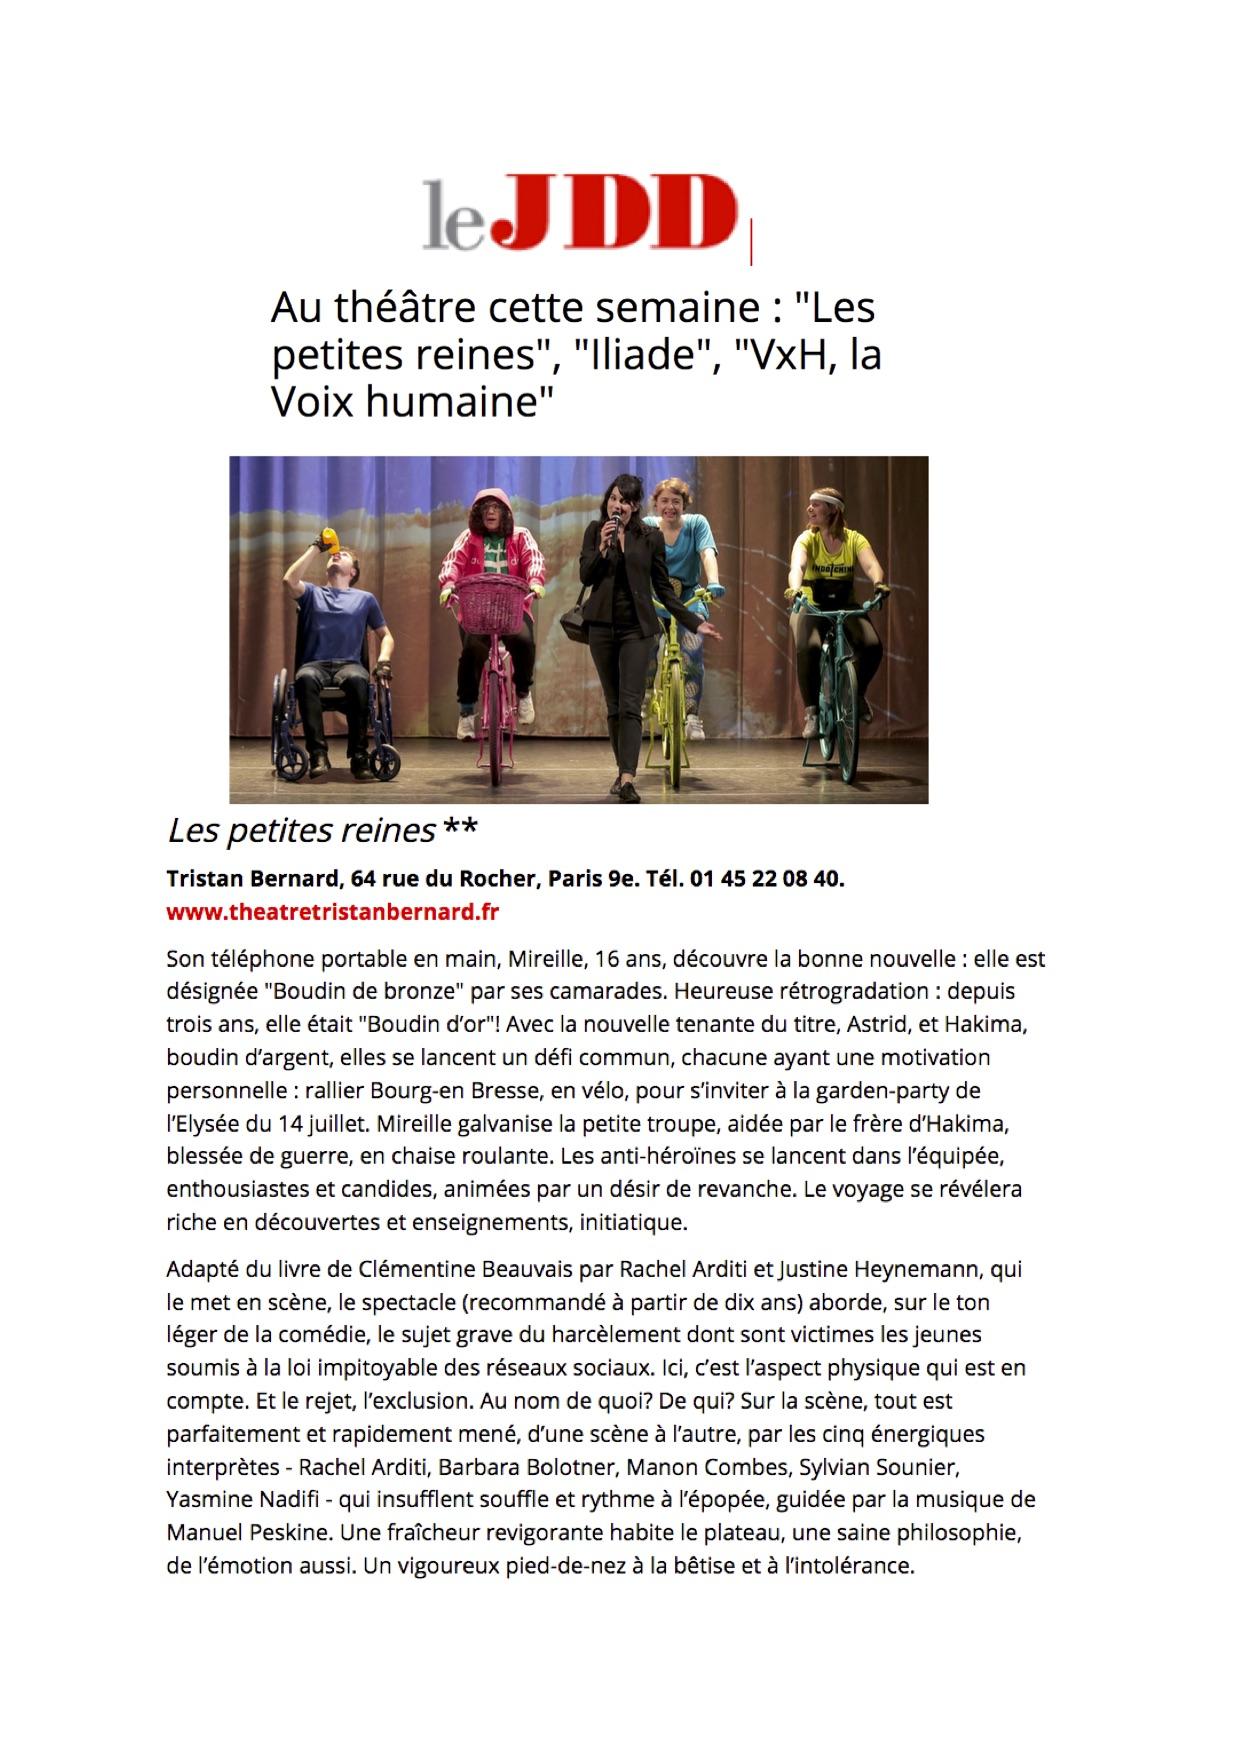 Le JDD 08.06.18